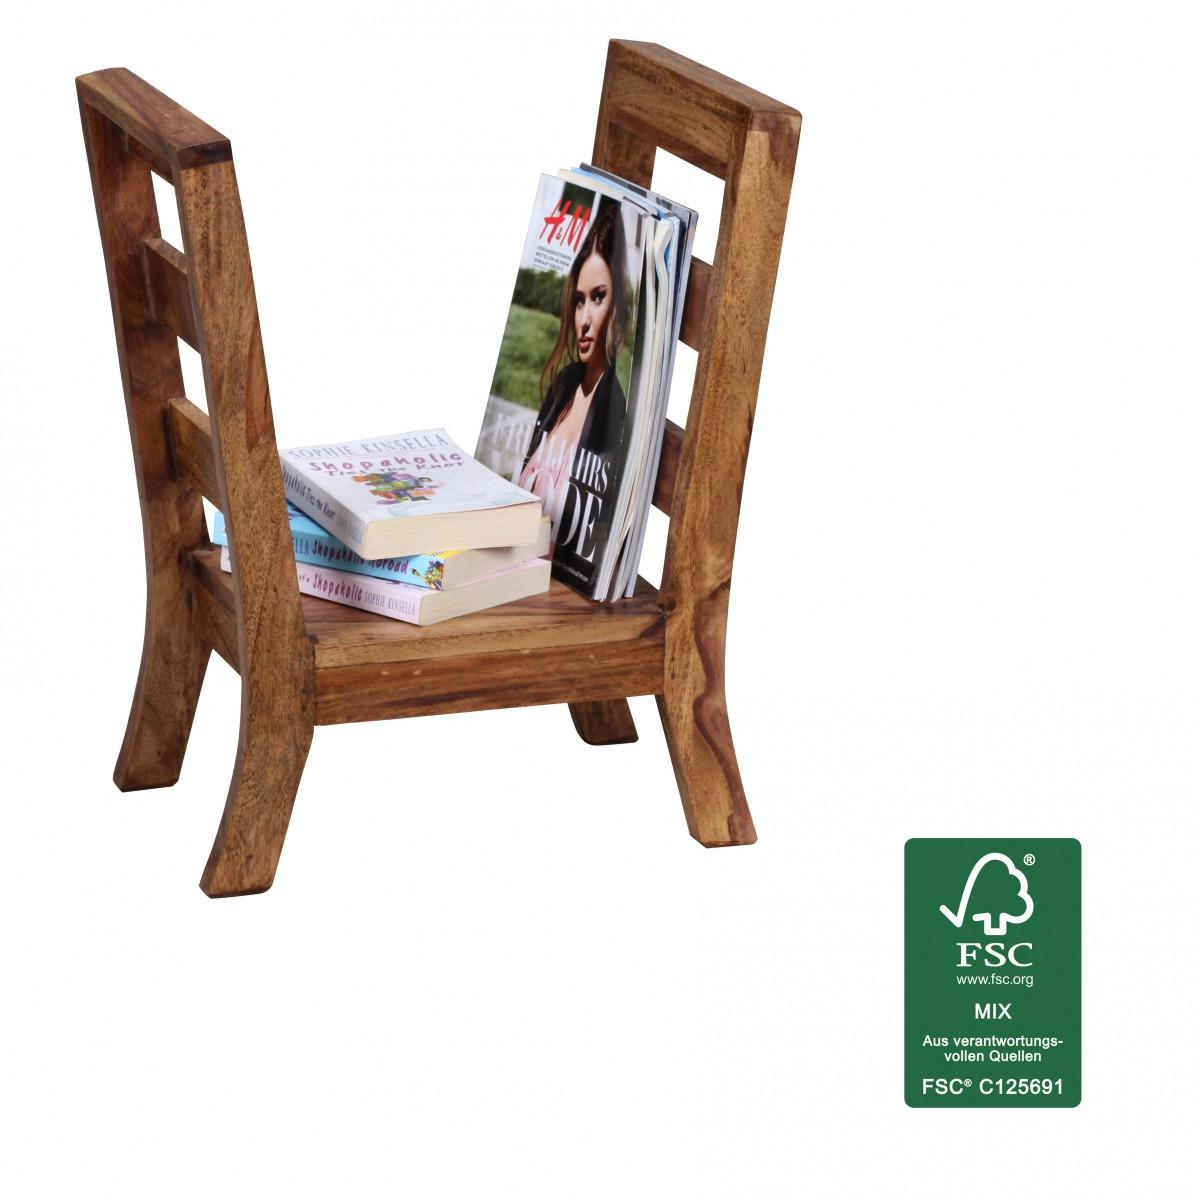 Wohnling sheesham porte revues en bois massif journal for Porte journaux en bois